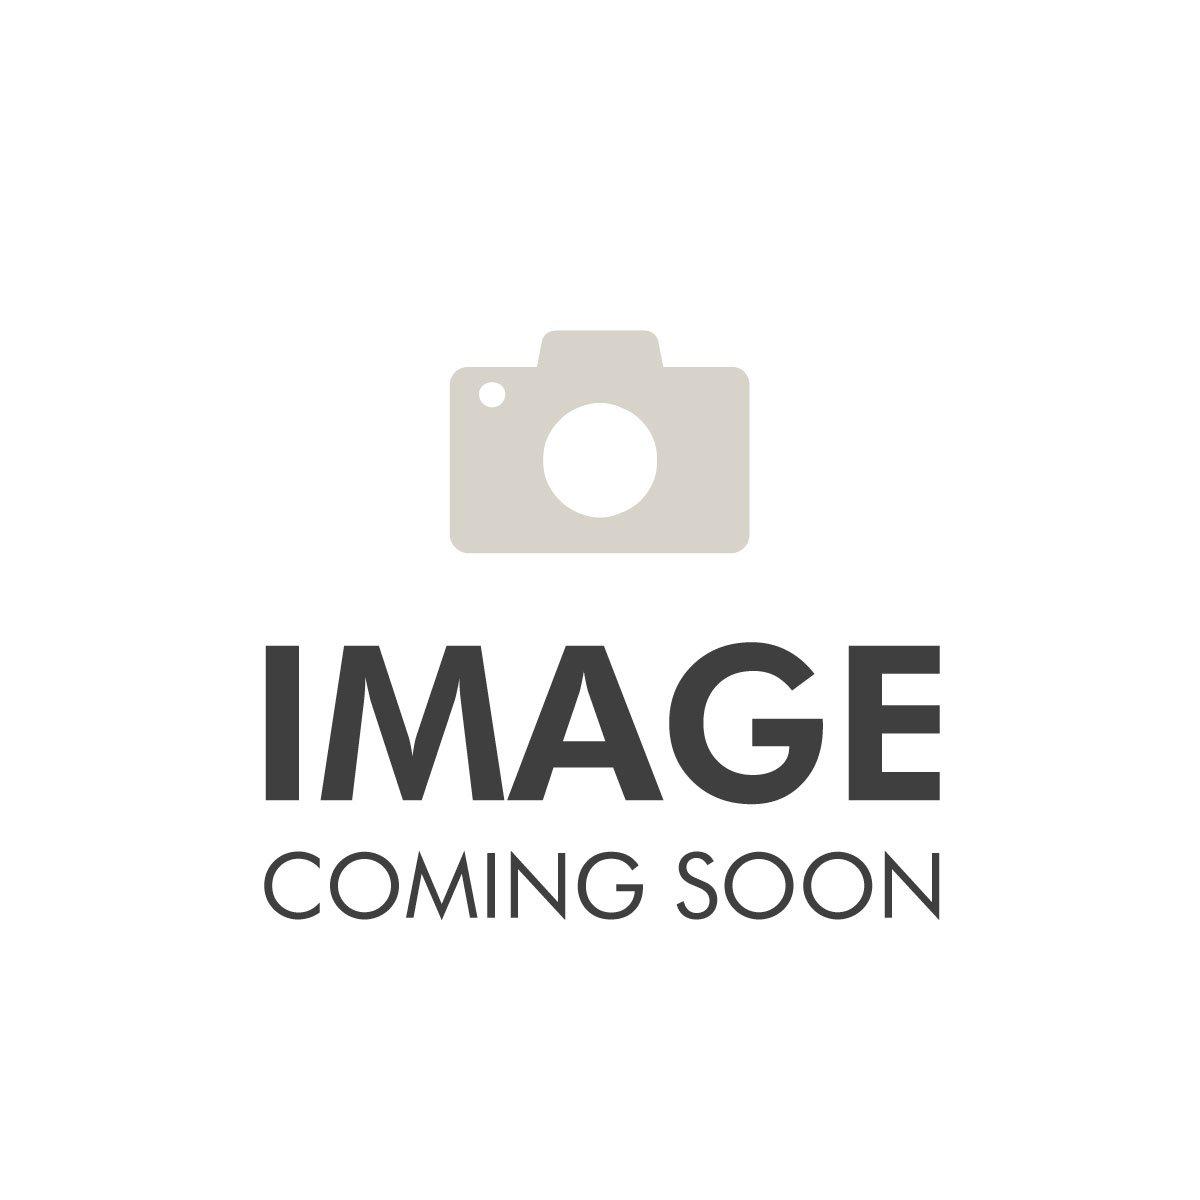 Bvlgari Bulgari Aqua Pour Homme Atlantique 200ml Shampoo & Shower Gel